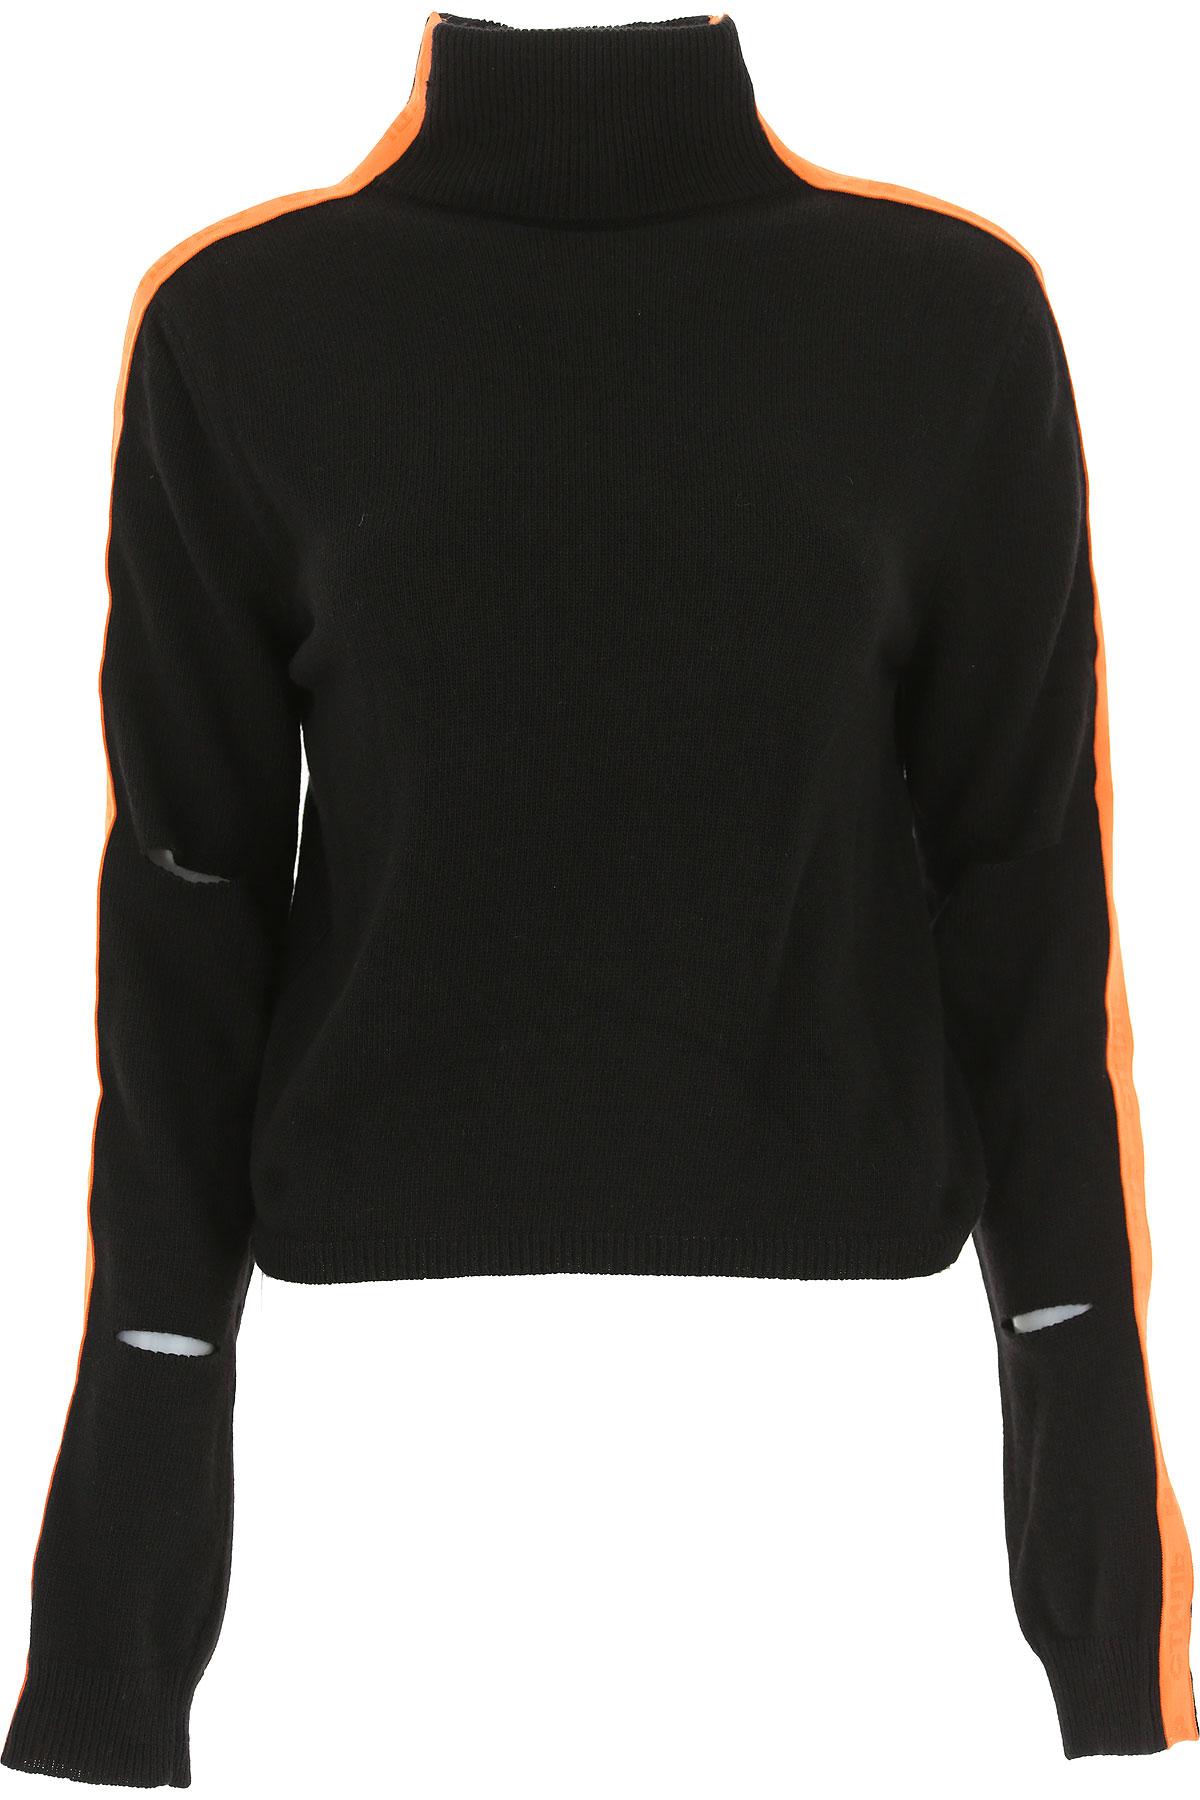 Image of Heron Preston Sweater for Women Jumper, Black, Extrafine Baby Merinos Wool, 2017, 2 4 6 8